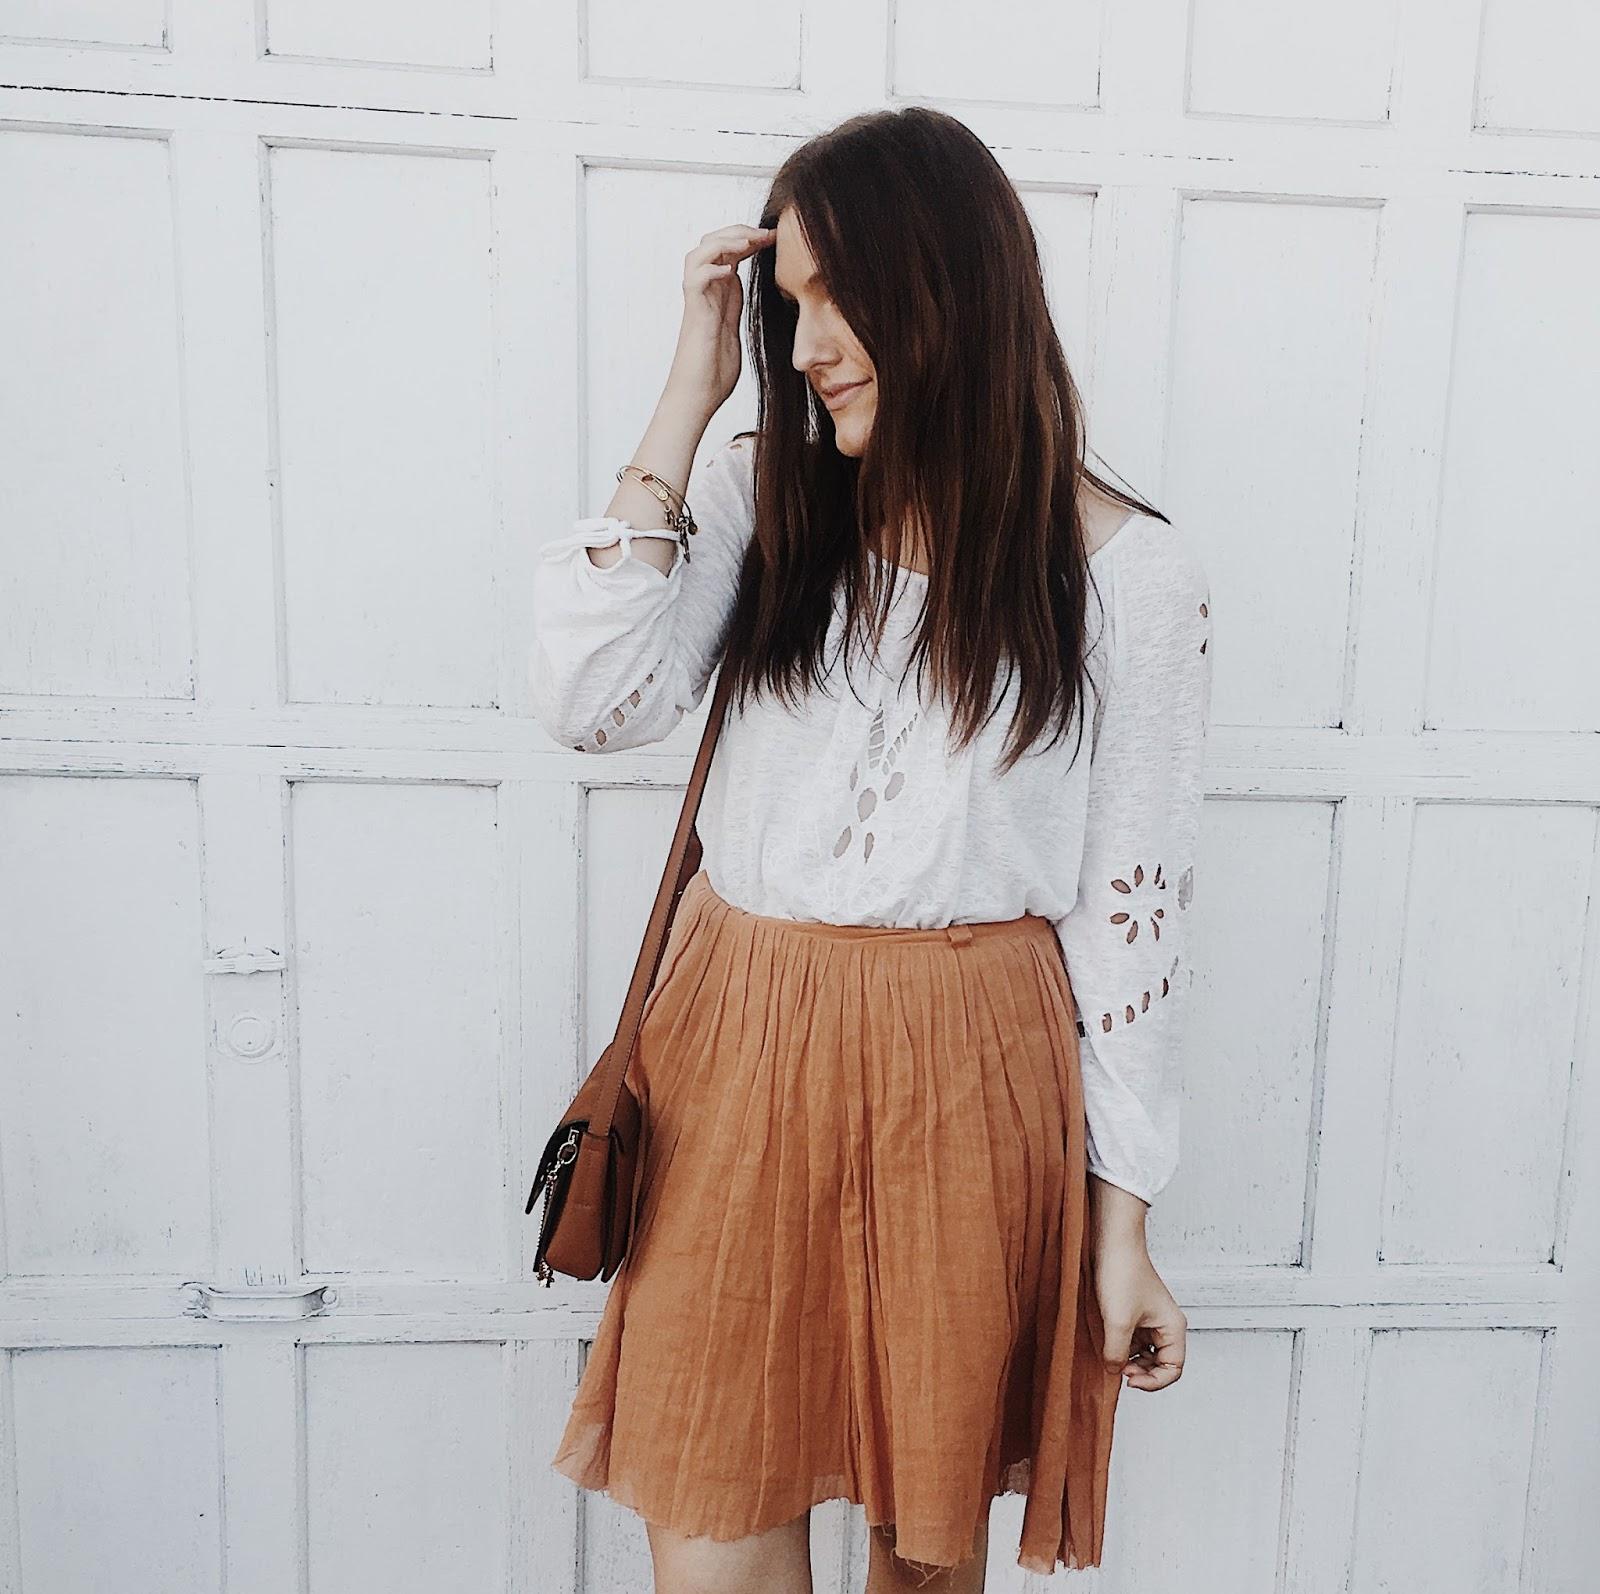 social media validation sabo skirt outfit